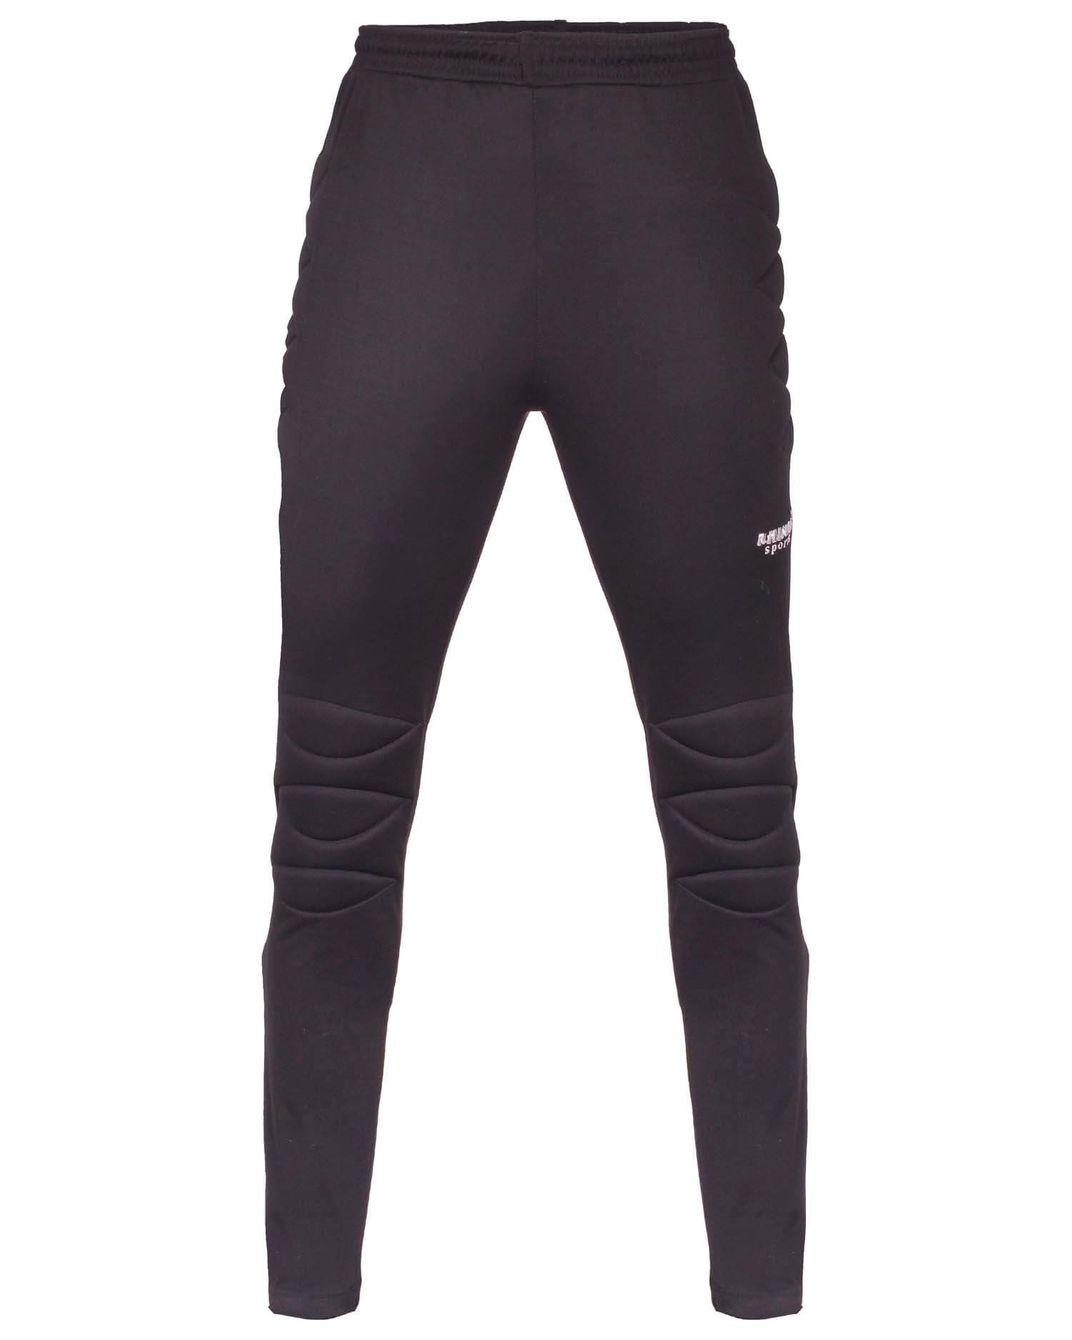 Training | spodnie bramkarskie